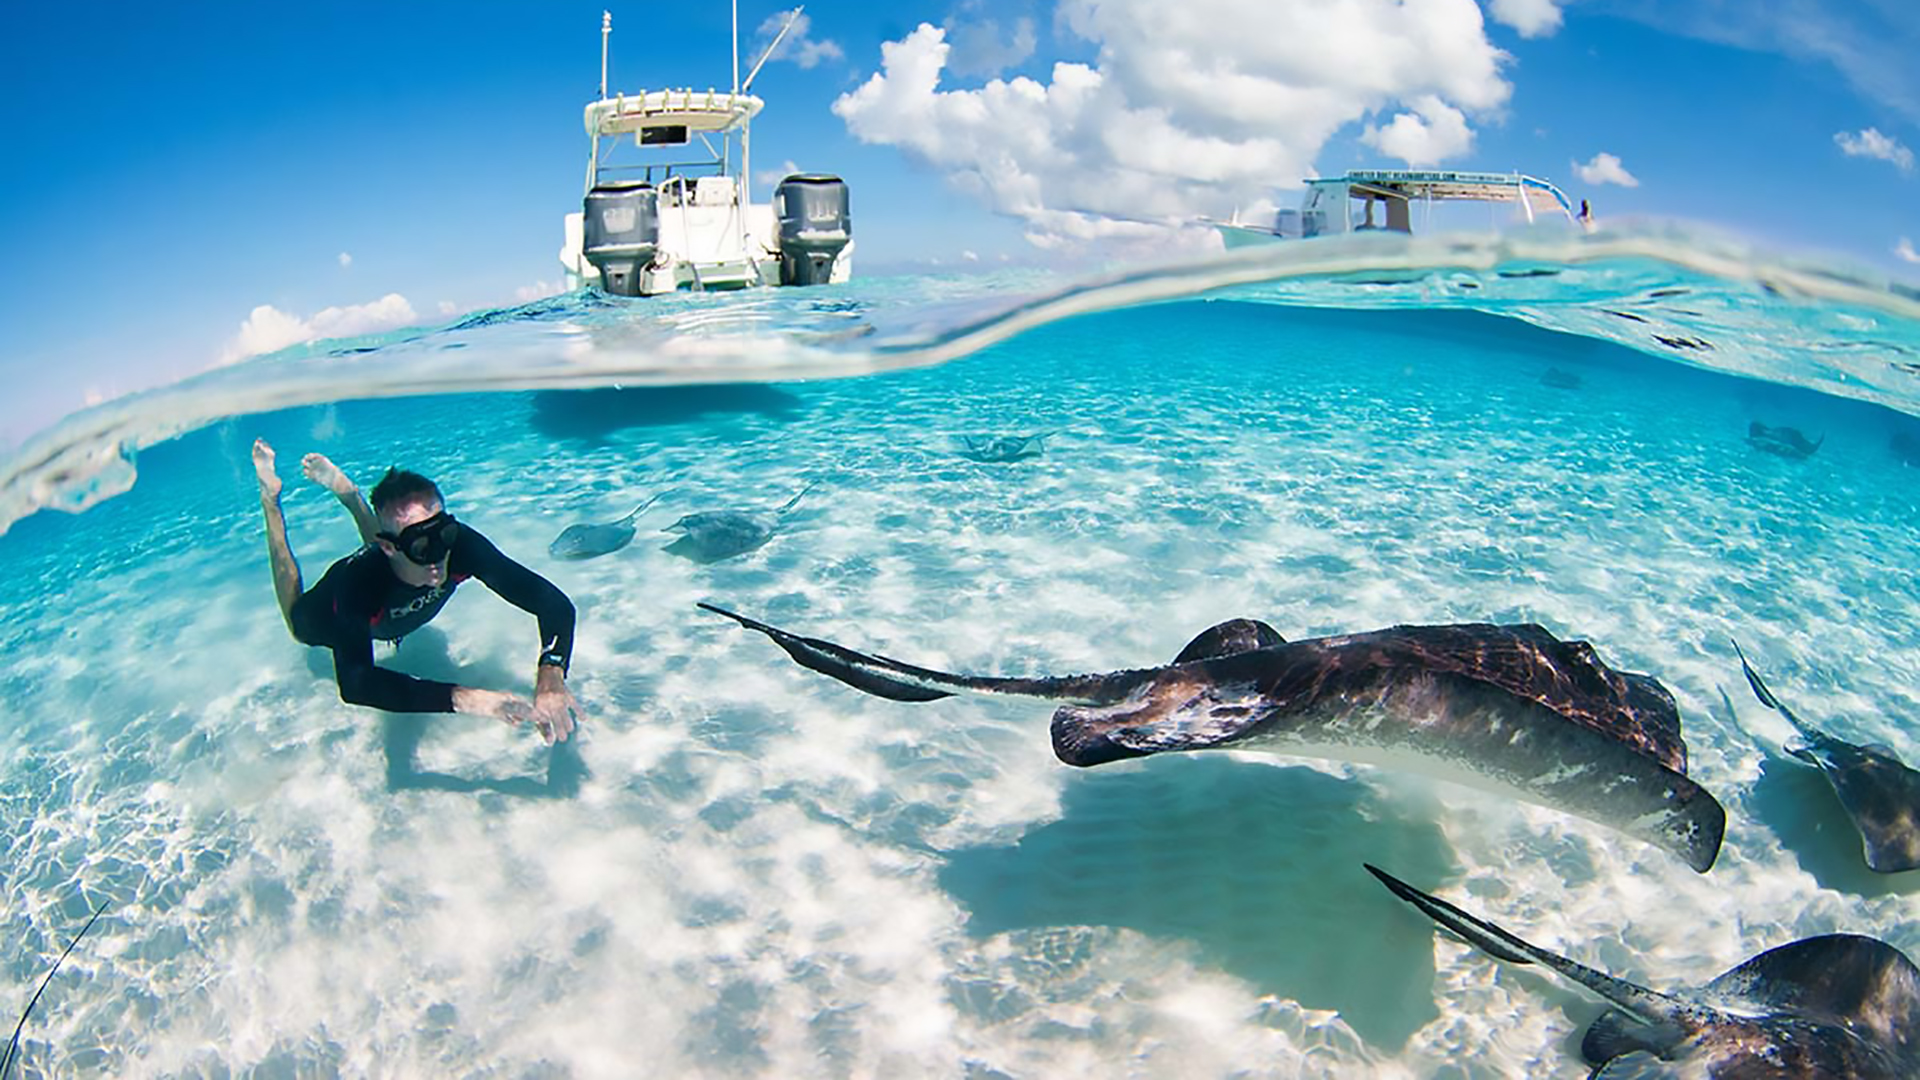 grand cayman photographer underwater stingray www.irenecorti.com